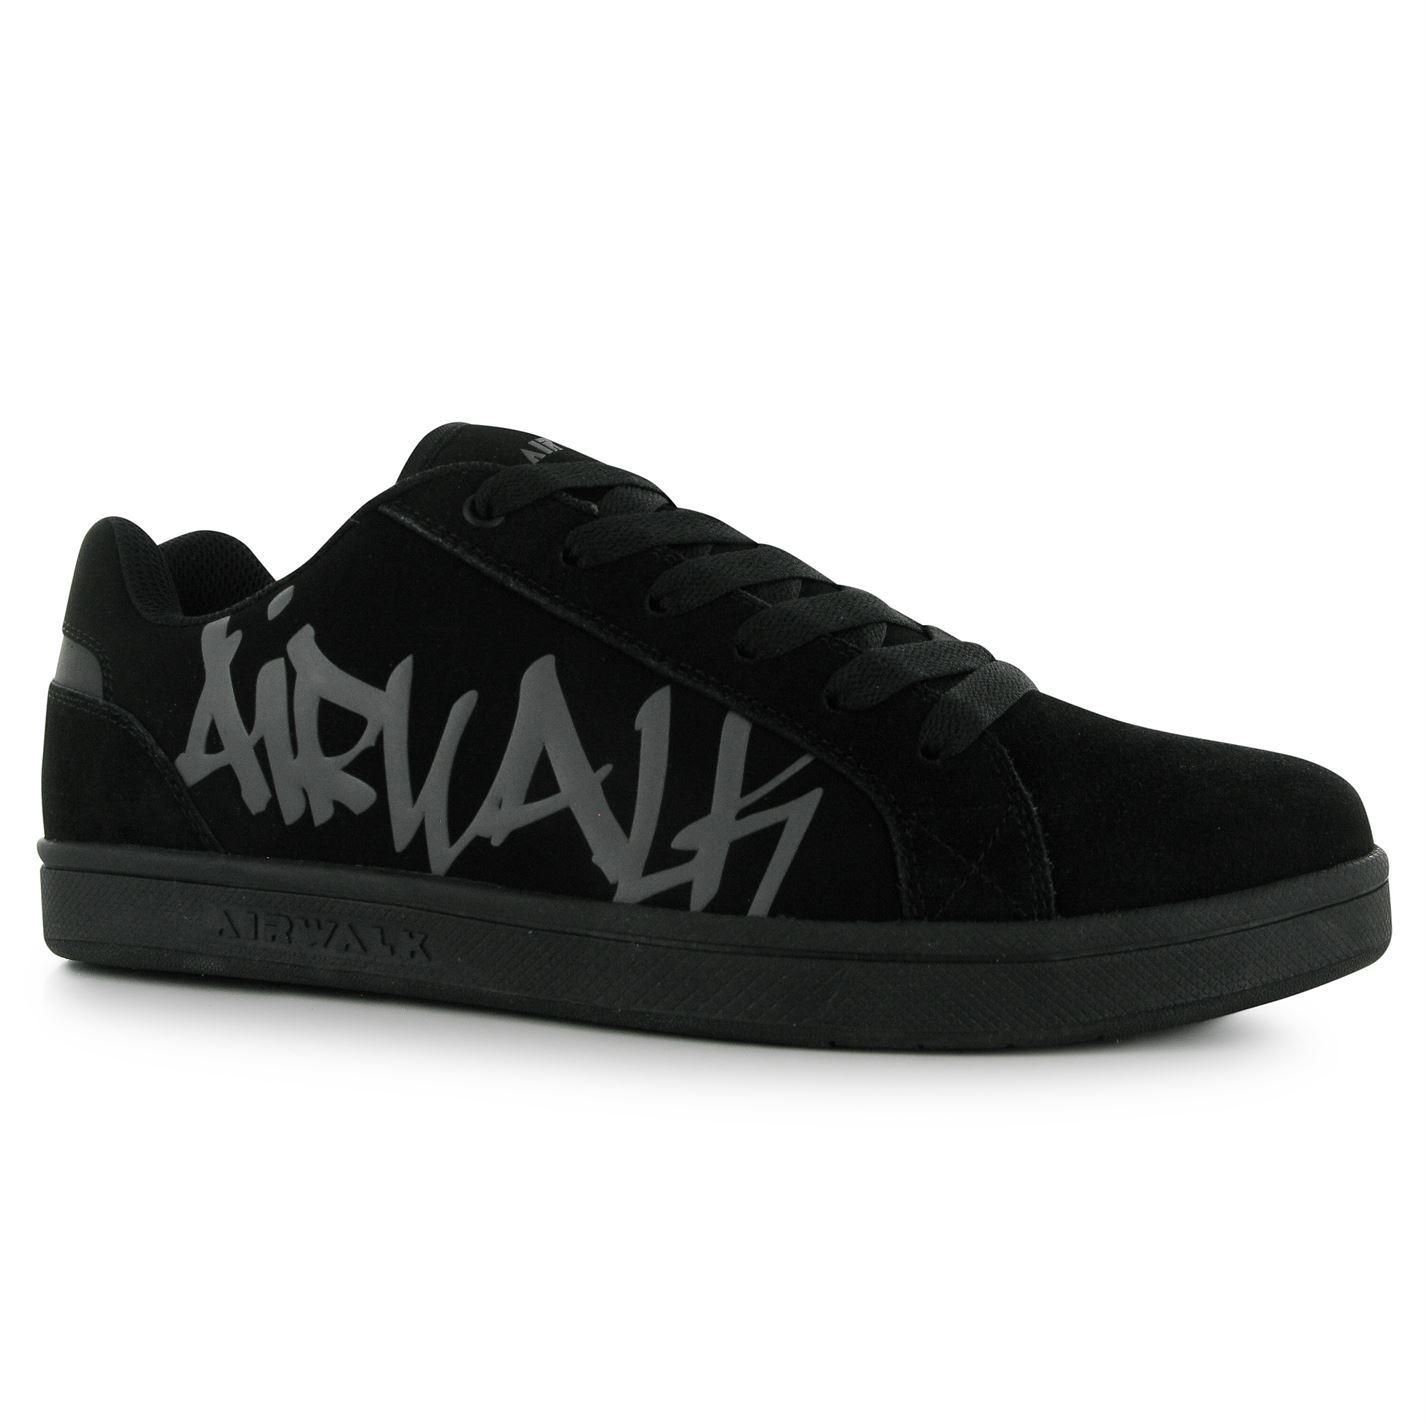 Airwalk Neptune Skate Shoes Juniors